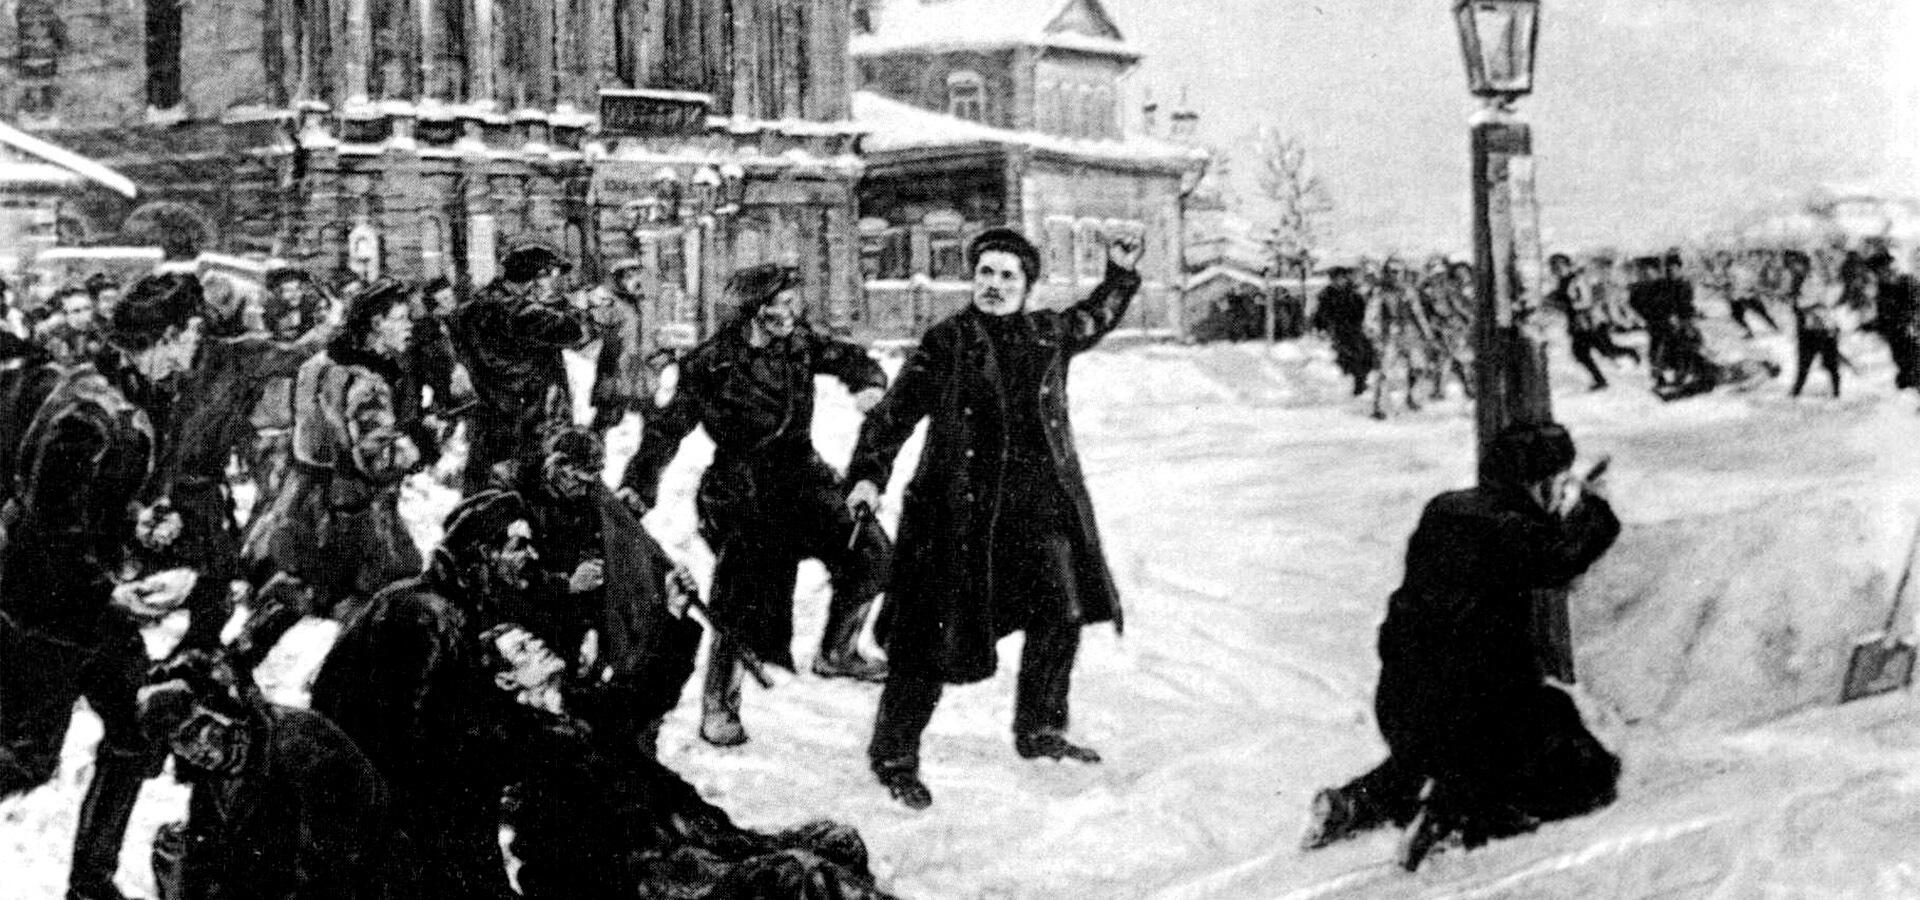 Имя в названии: Иван Бабушкин — алмаз революции